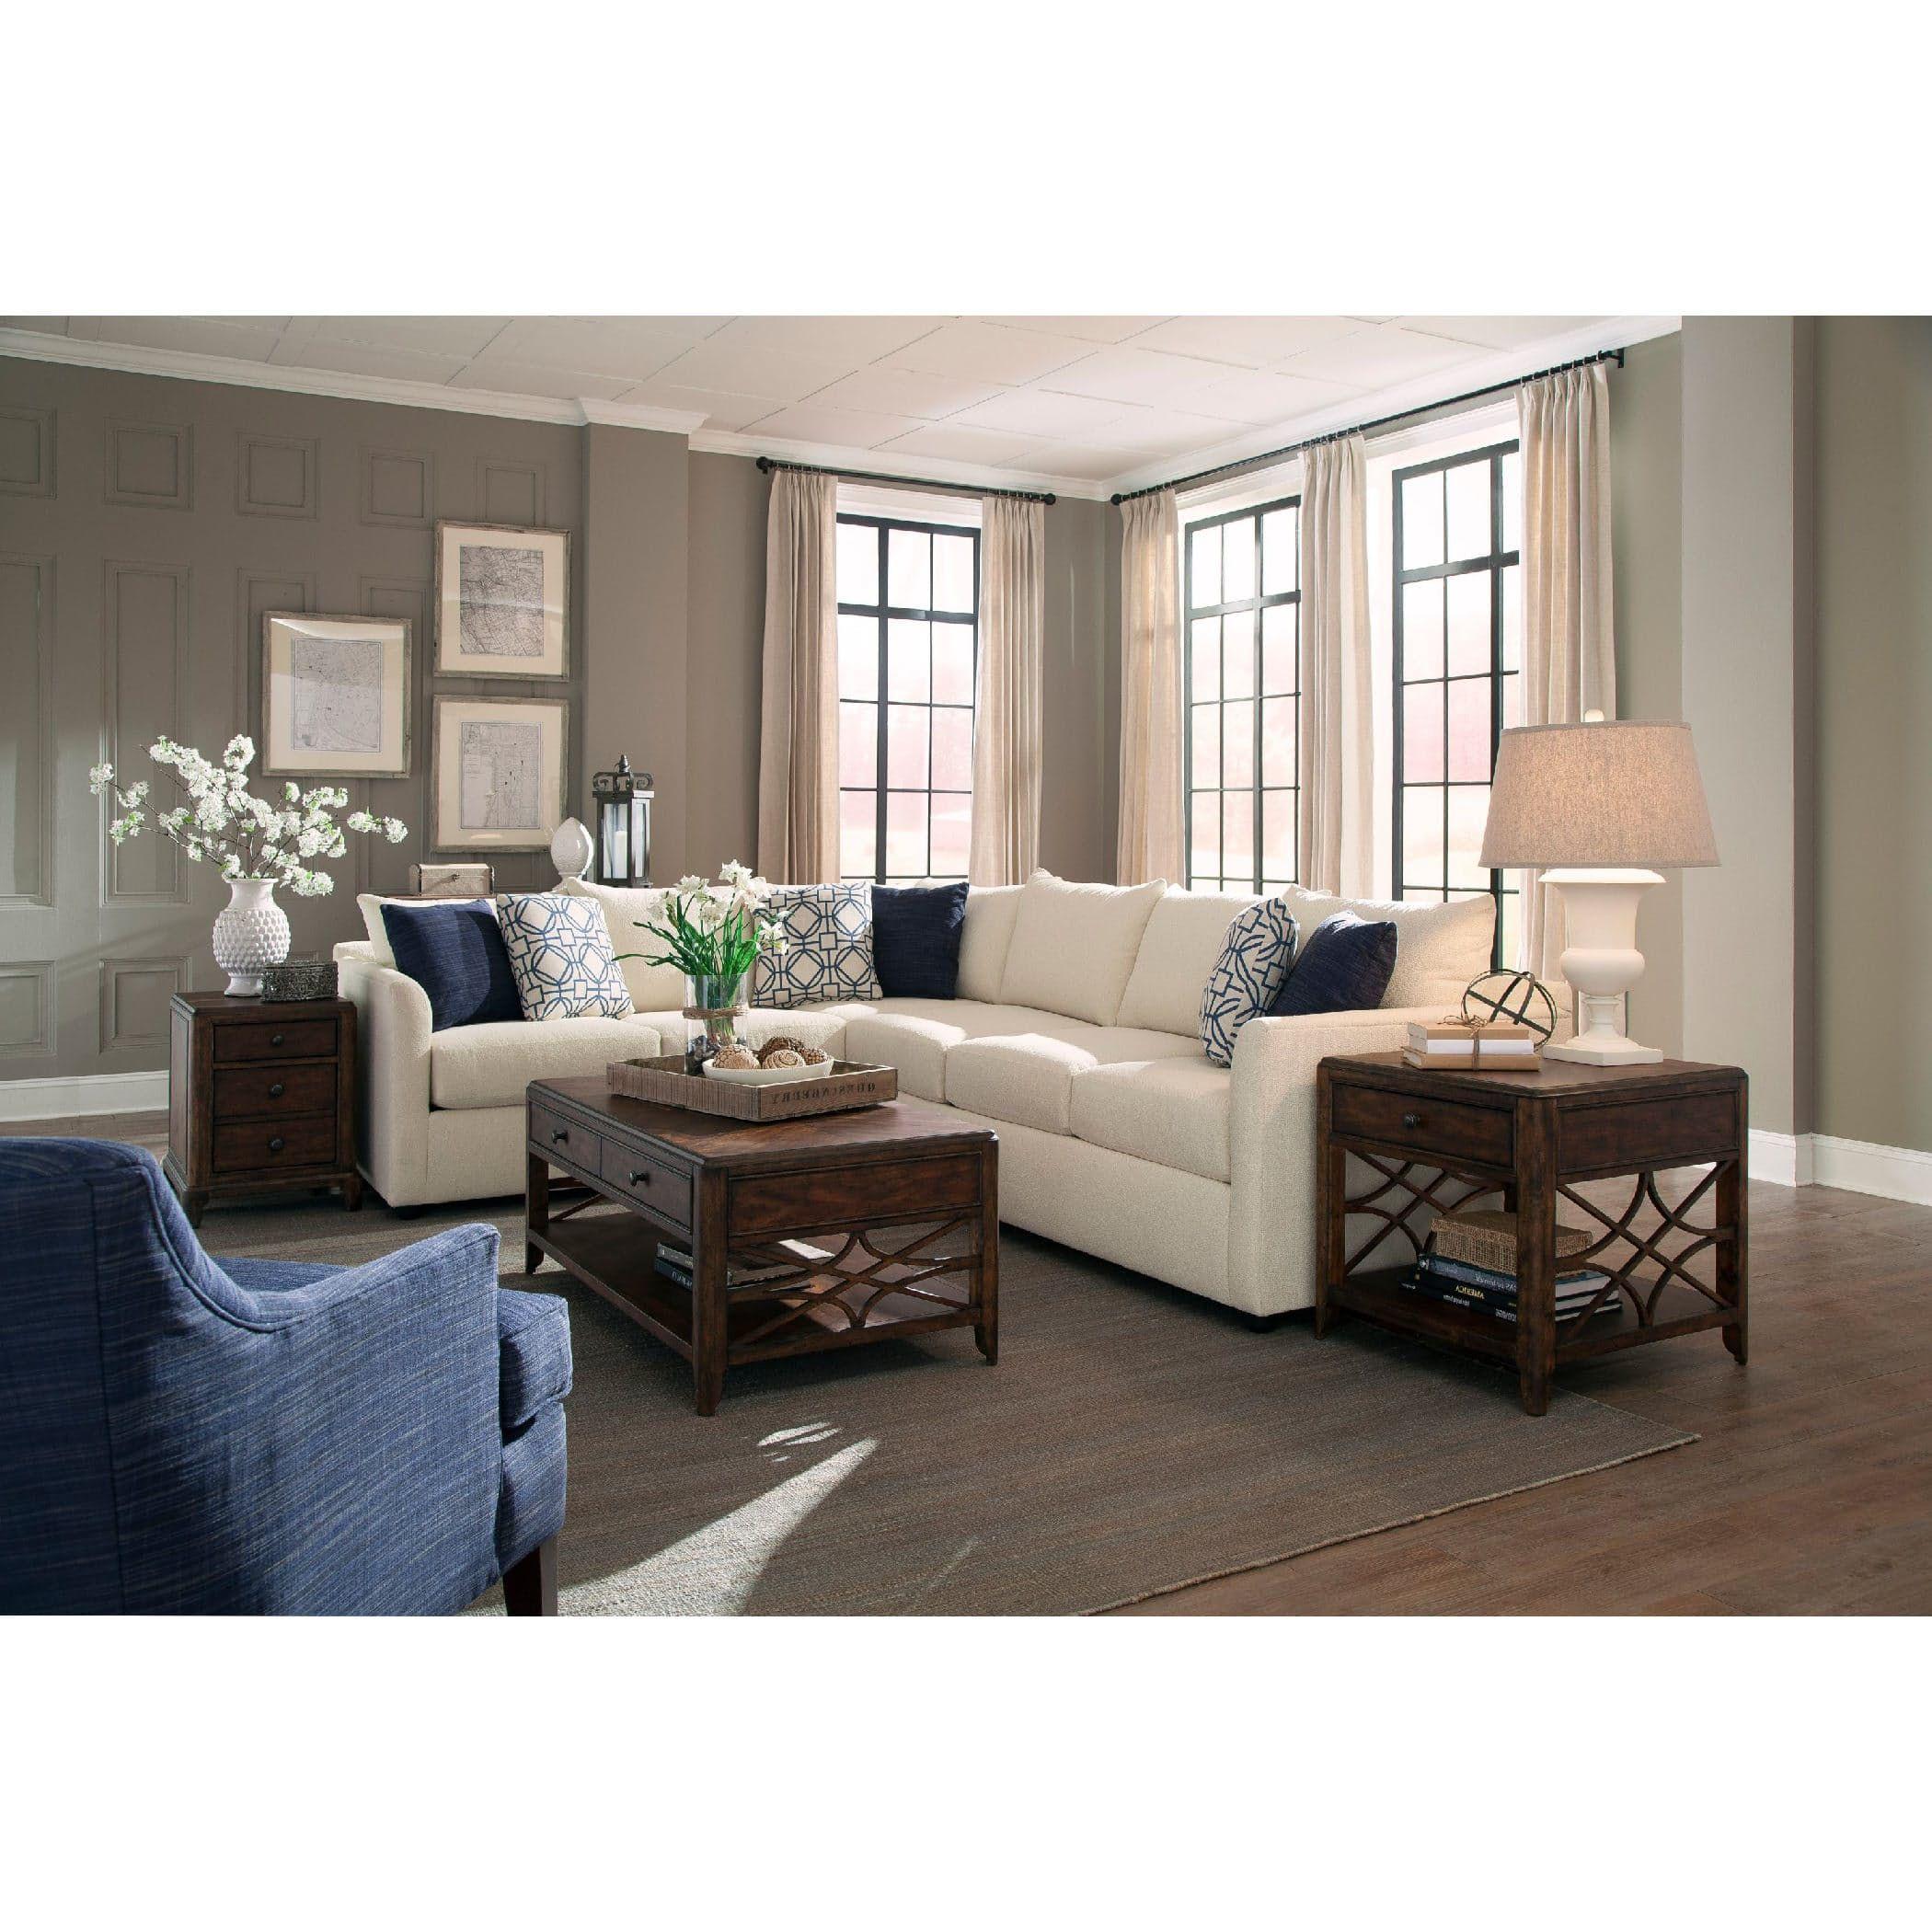 Hausratversicherungkosten Cheap Living Room Sets Atlanta In Collection 4964